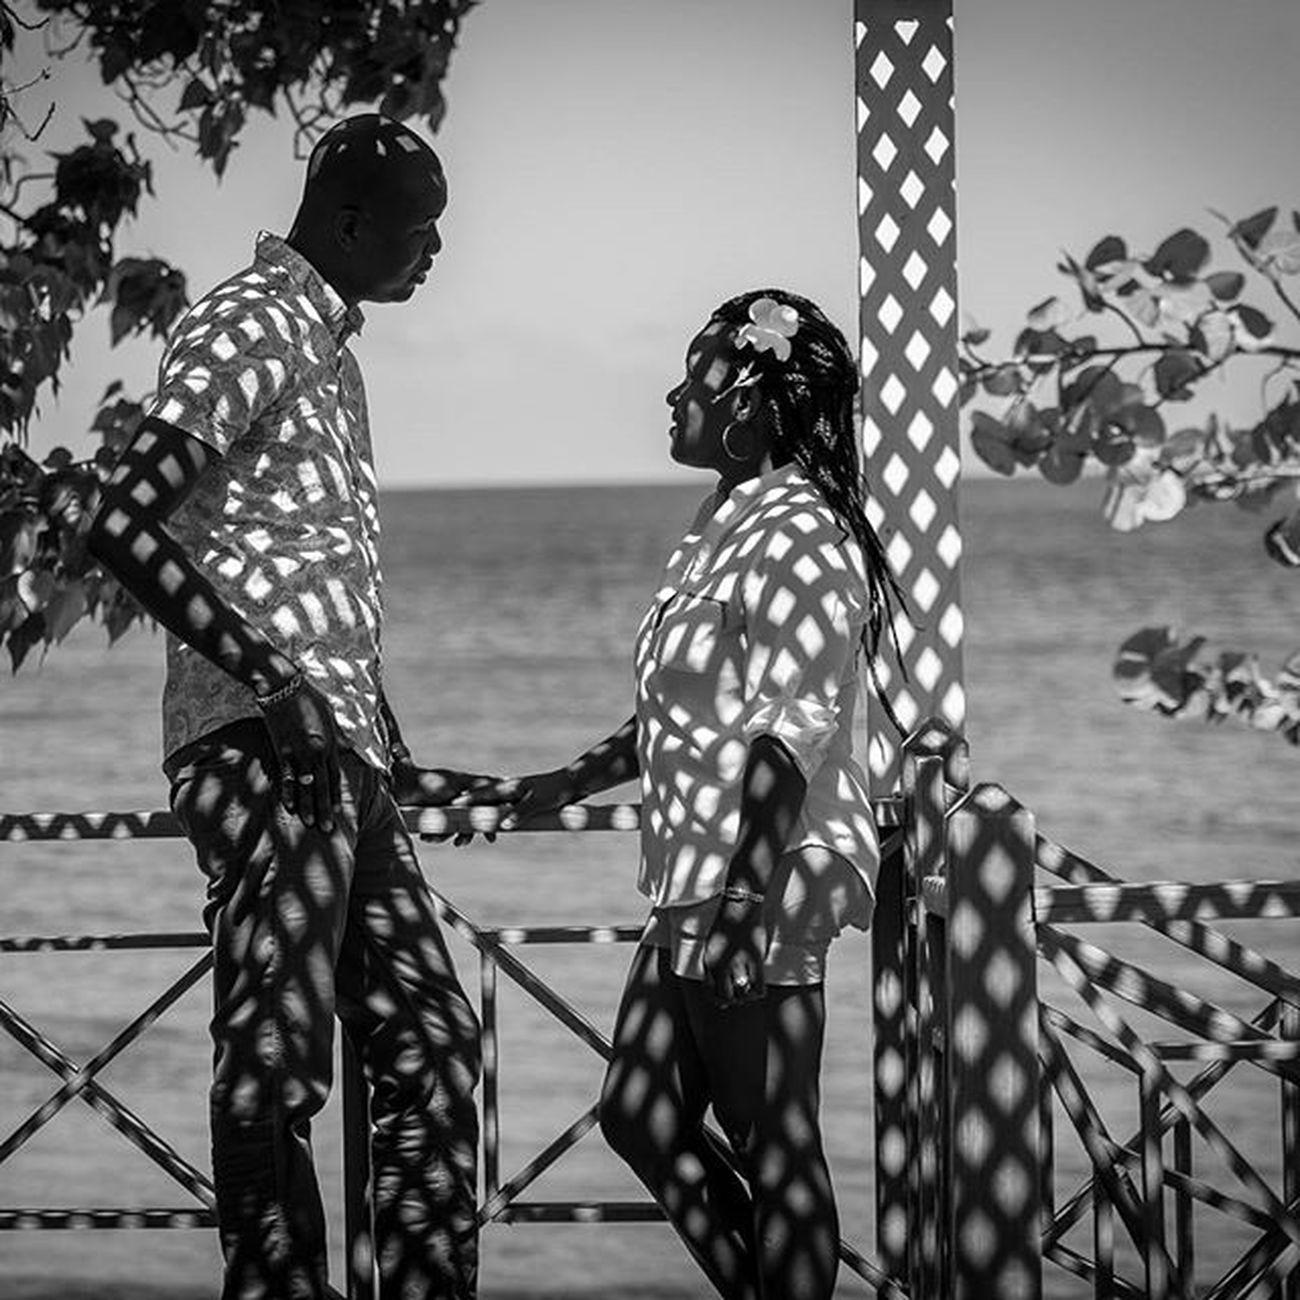 Andyjohnsonphotography Nikon Photography PureGrenada Golden_click Ilivewhereyouvacation LOVESCARIBBEANSEA Anniversary Photoshoot IshootGND